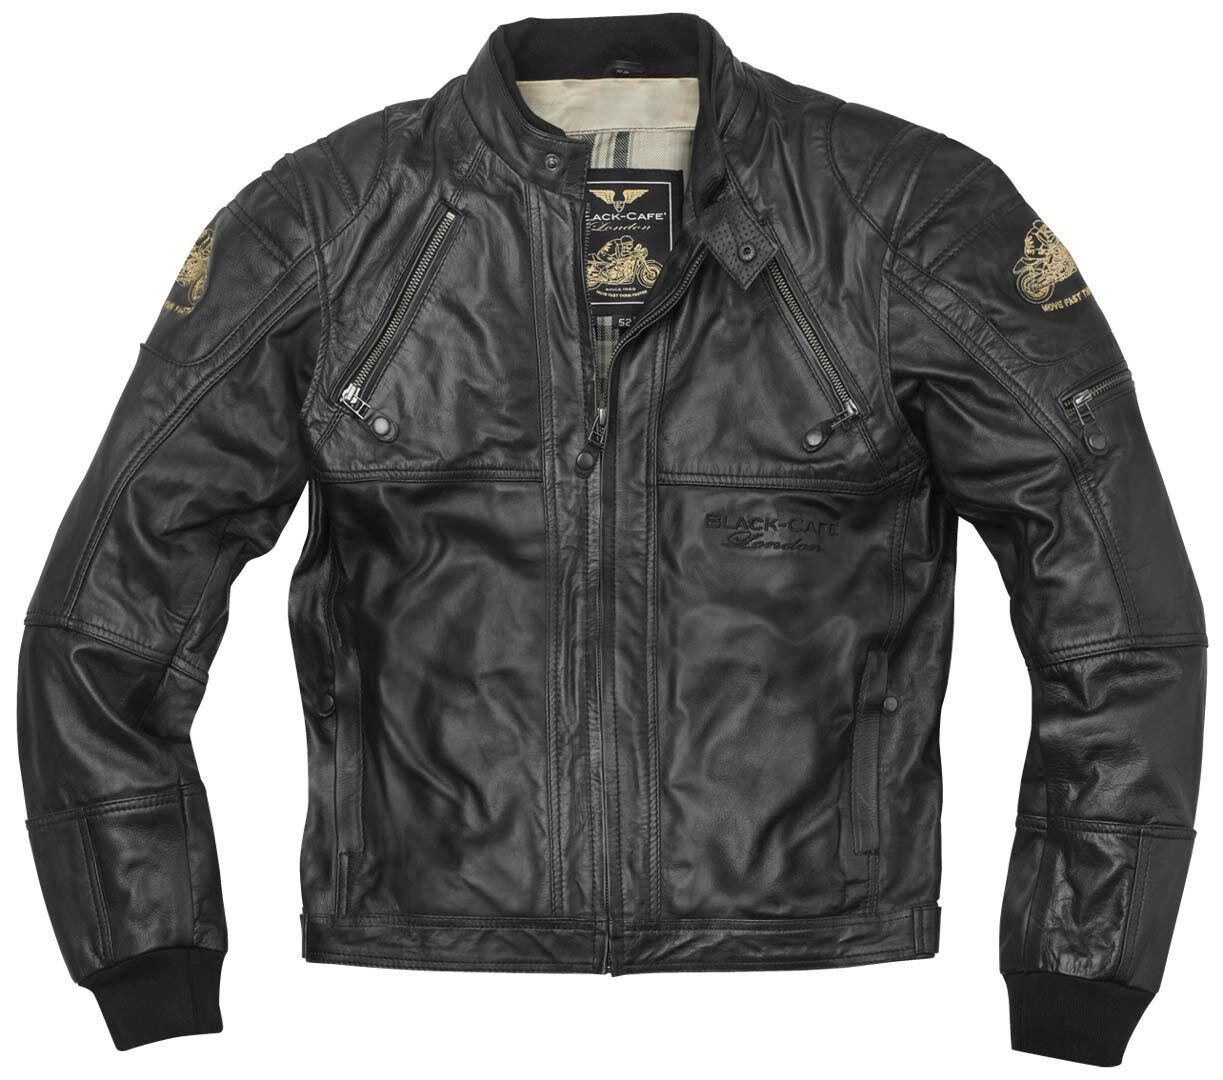 Black-Cafe London Dallas Veste en cuir de moto Noir taille : 54